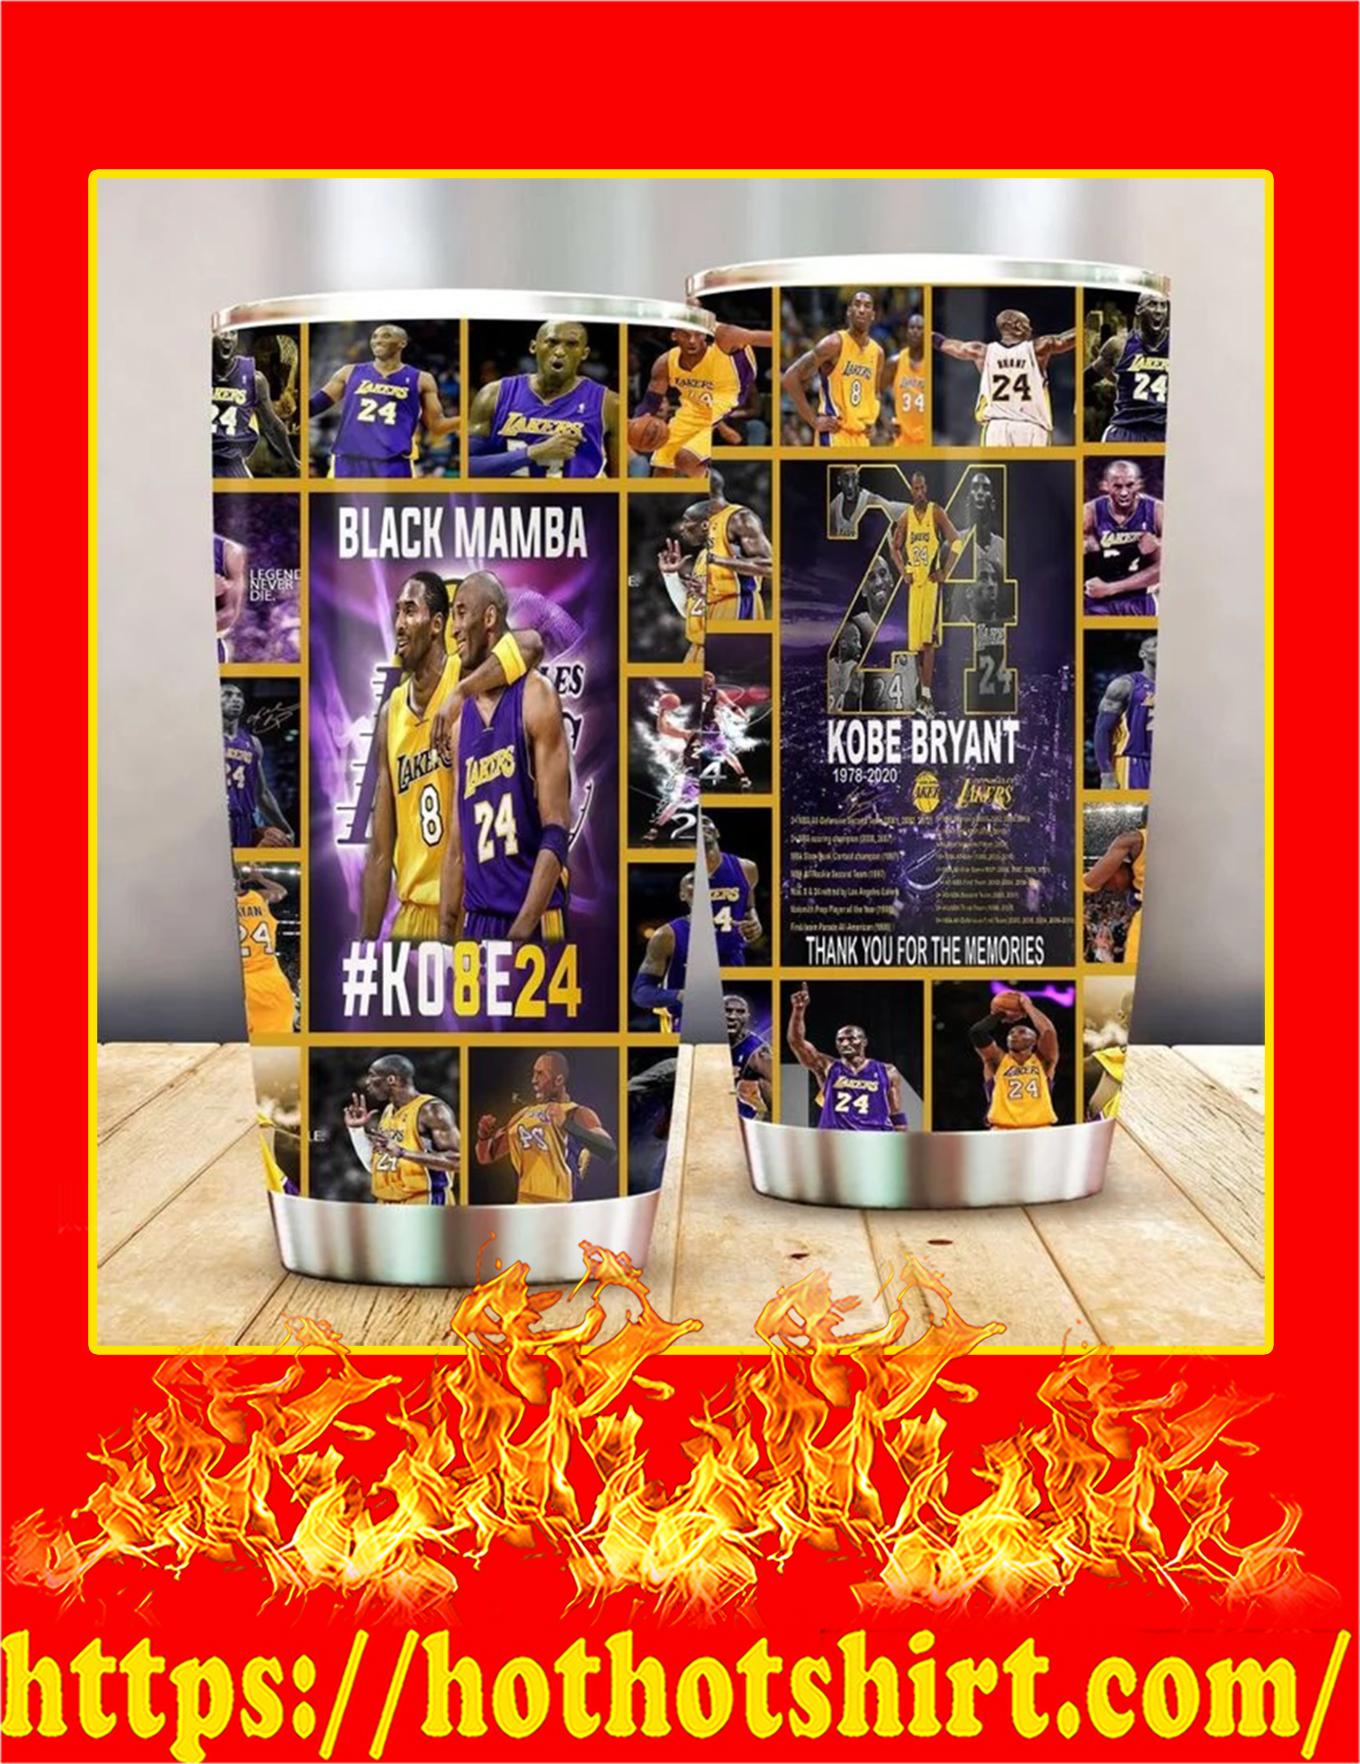 Kobe Bryant thank you for the memories tumbler - 30 oz